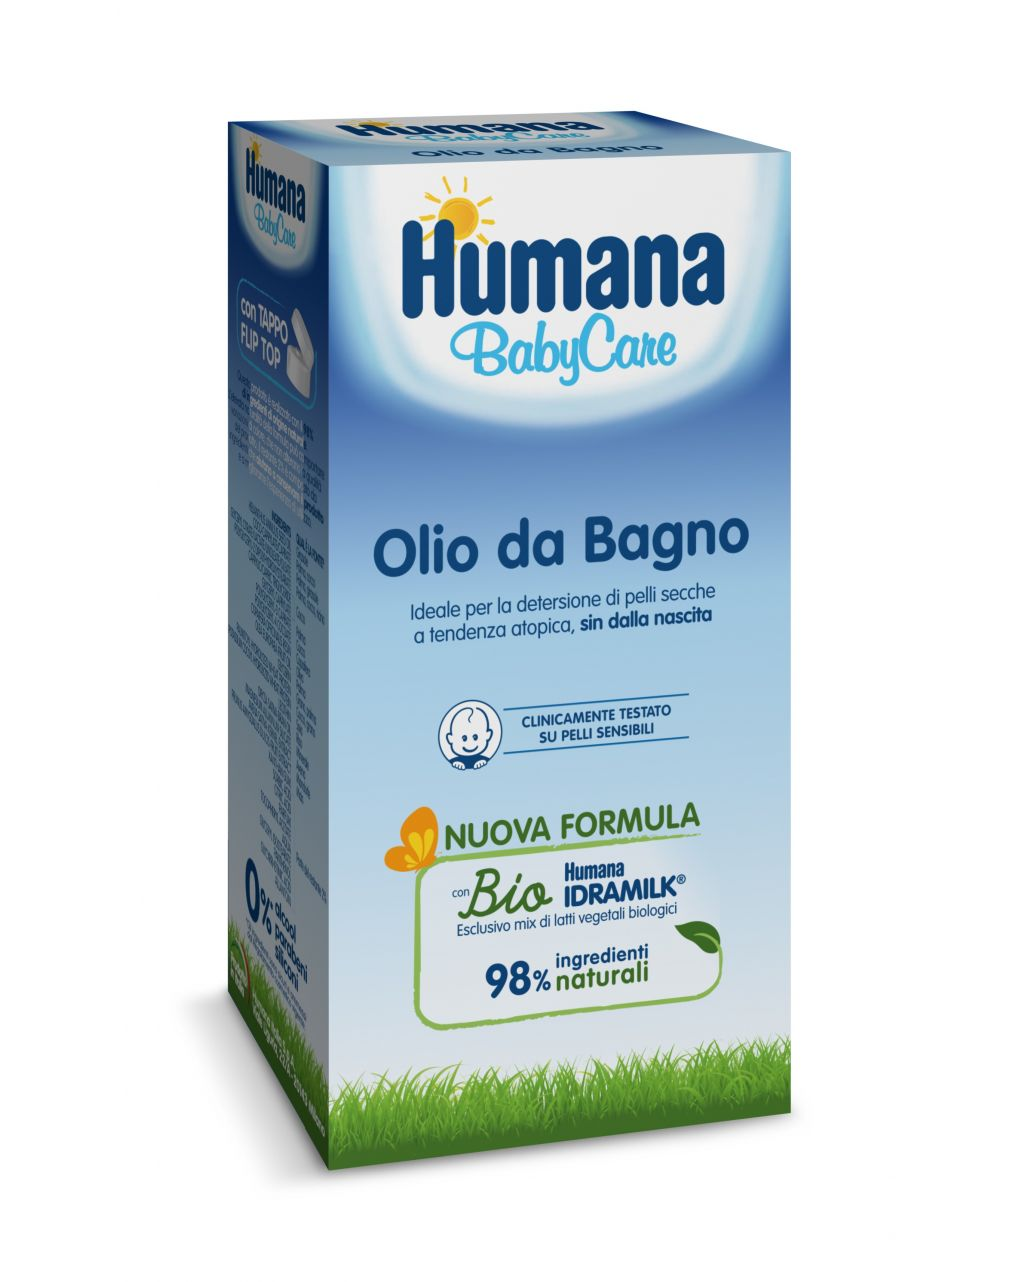 Olio da bagno 200 ml - Humana Baby Care